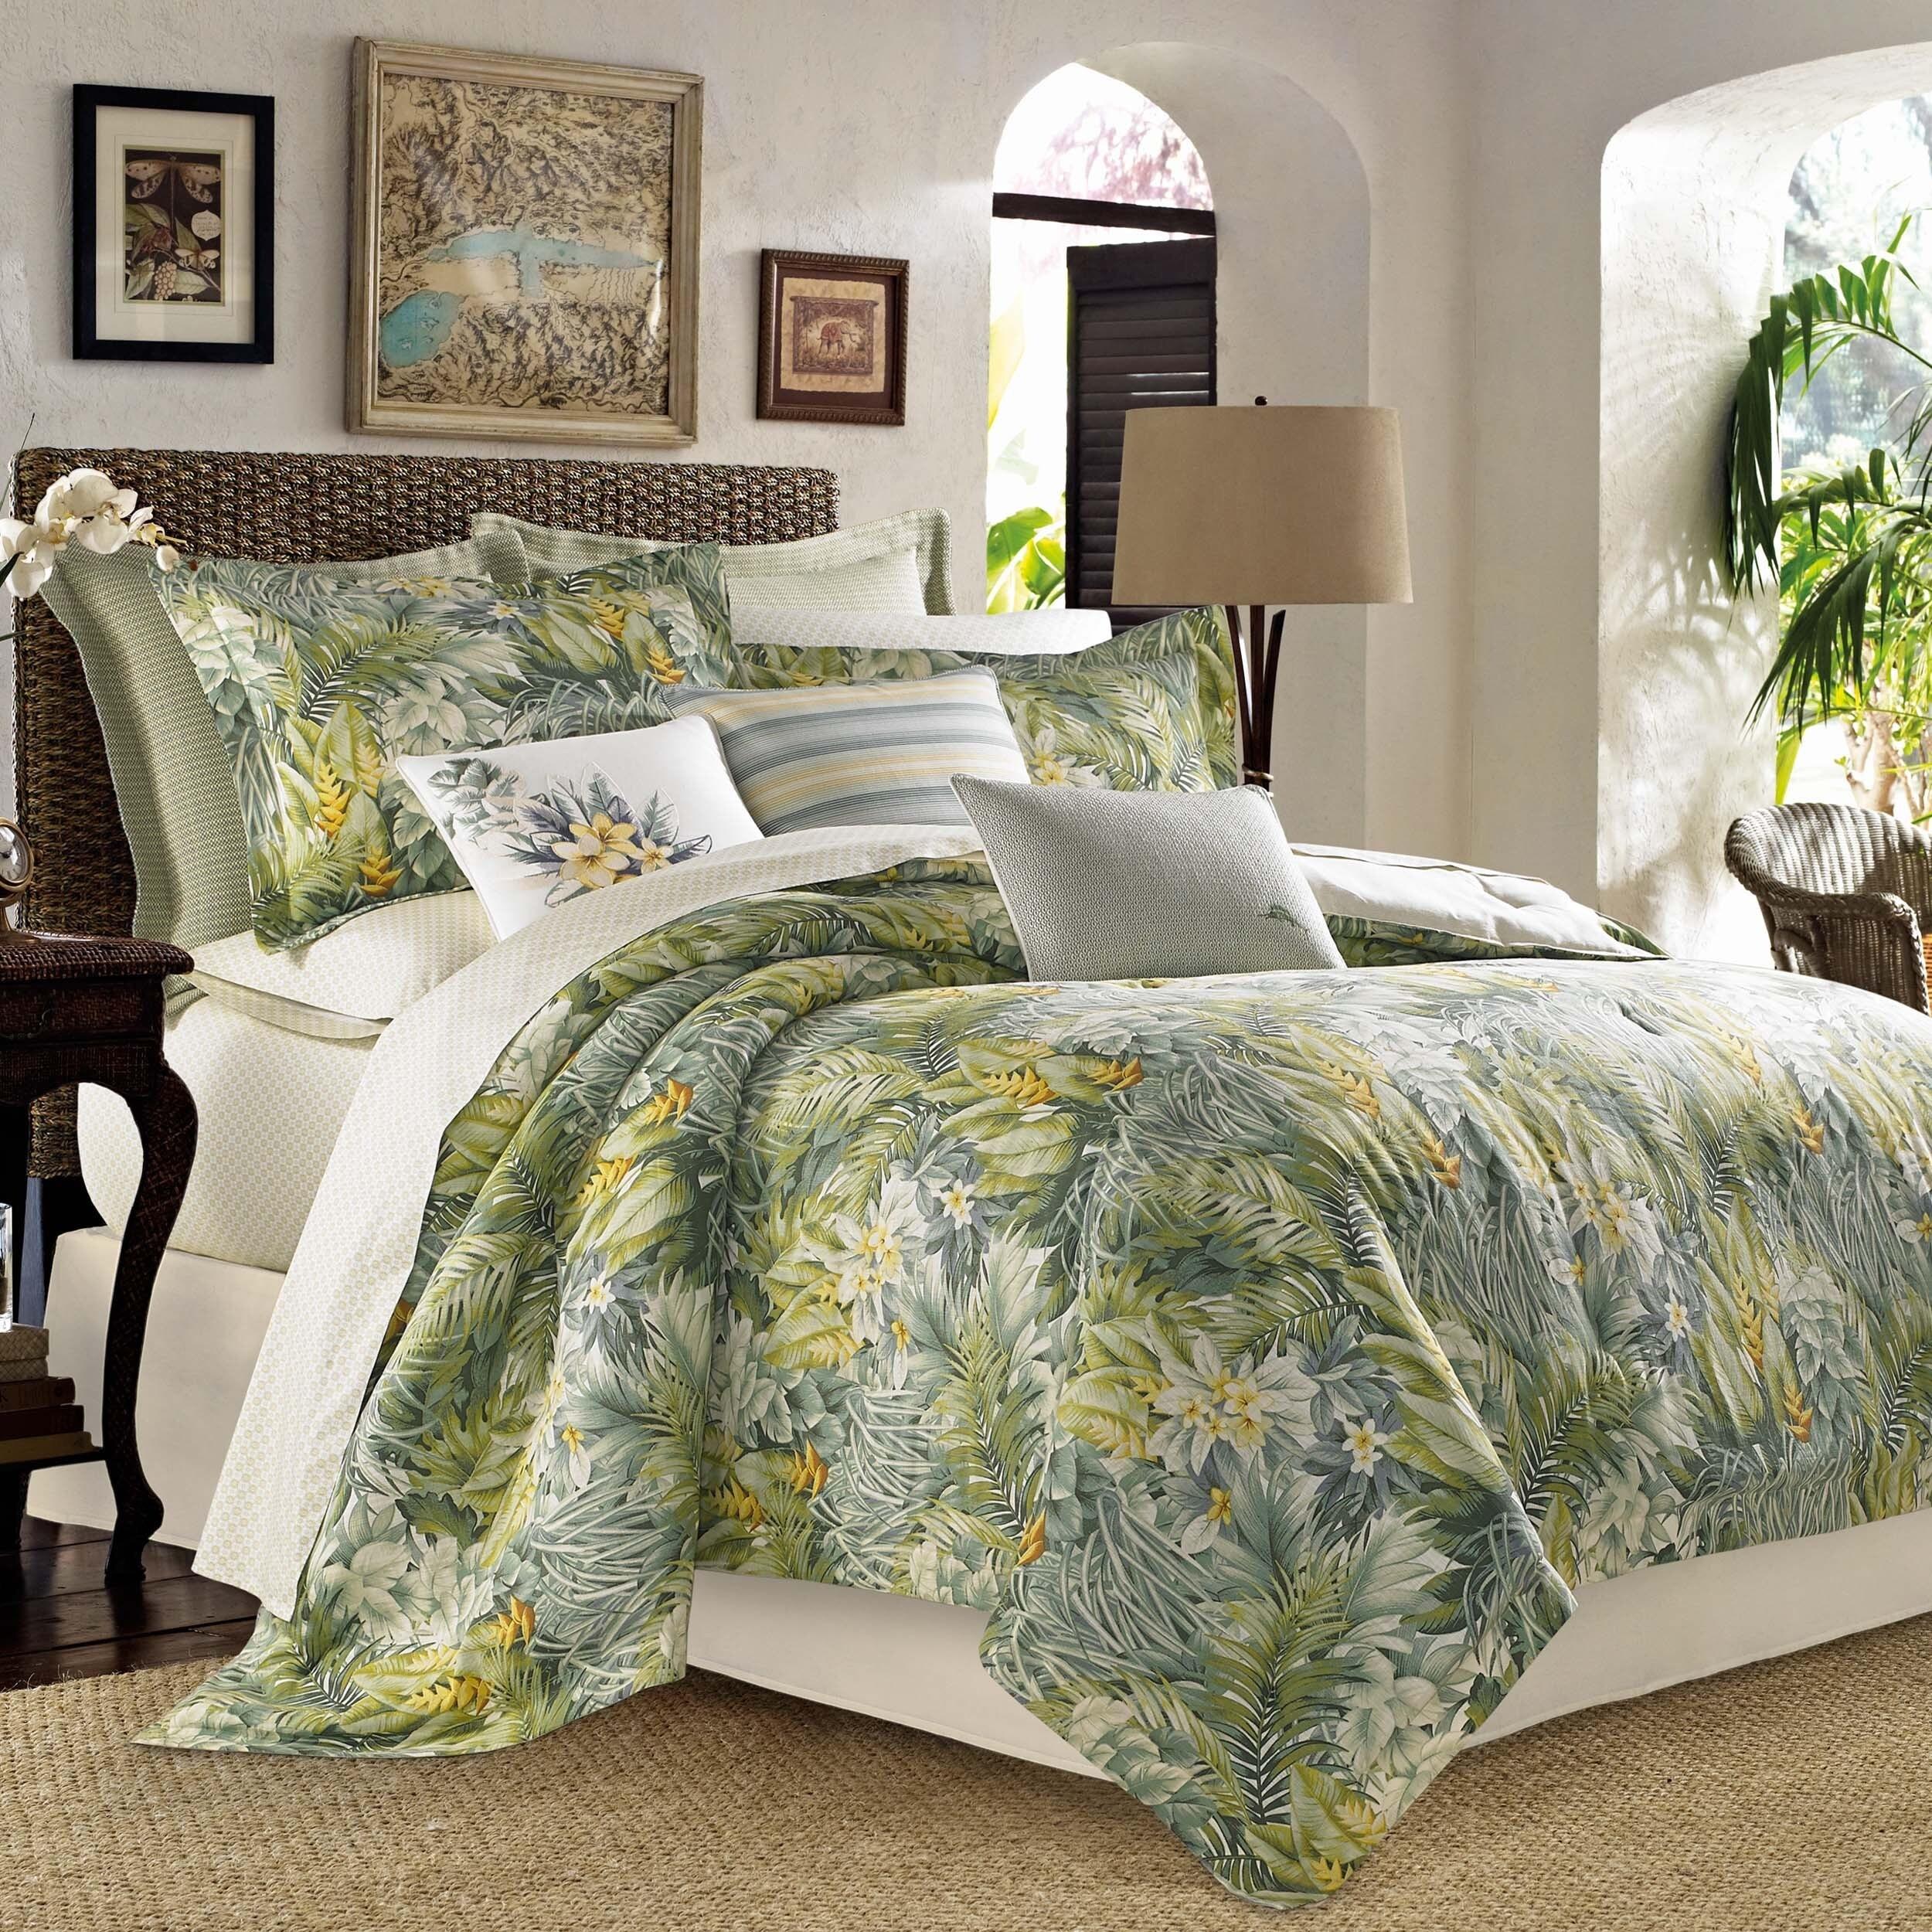 bahama p comforter only desktop zoom comp orange online piece tommy a collection set src cay product belk dwp king layer